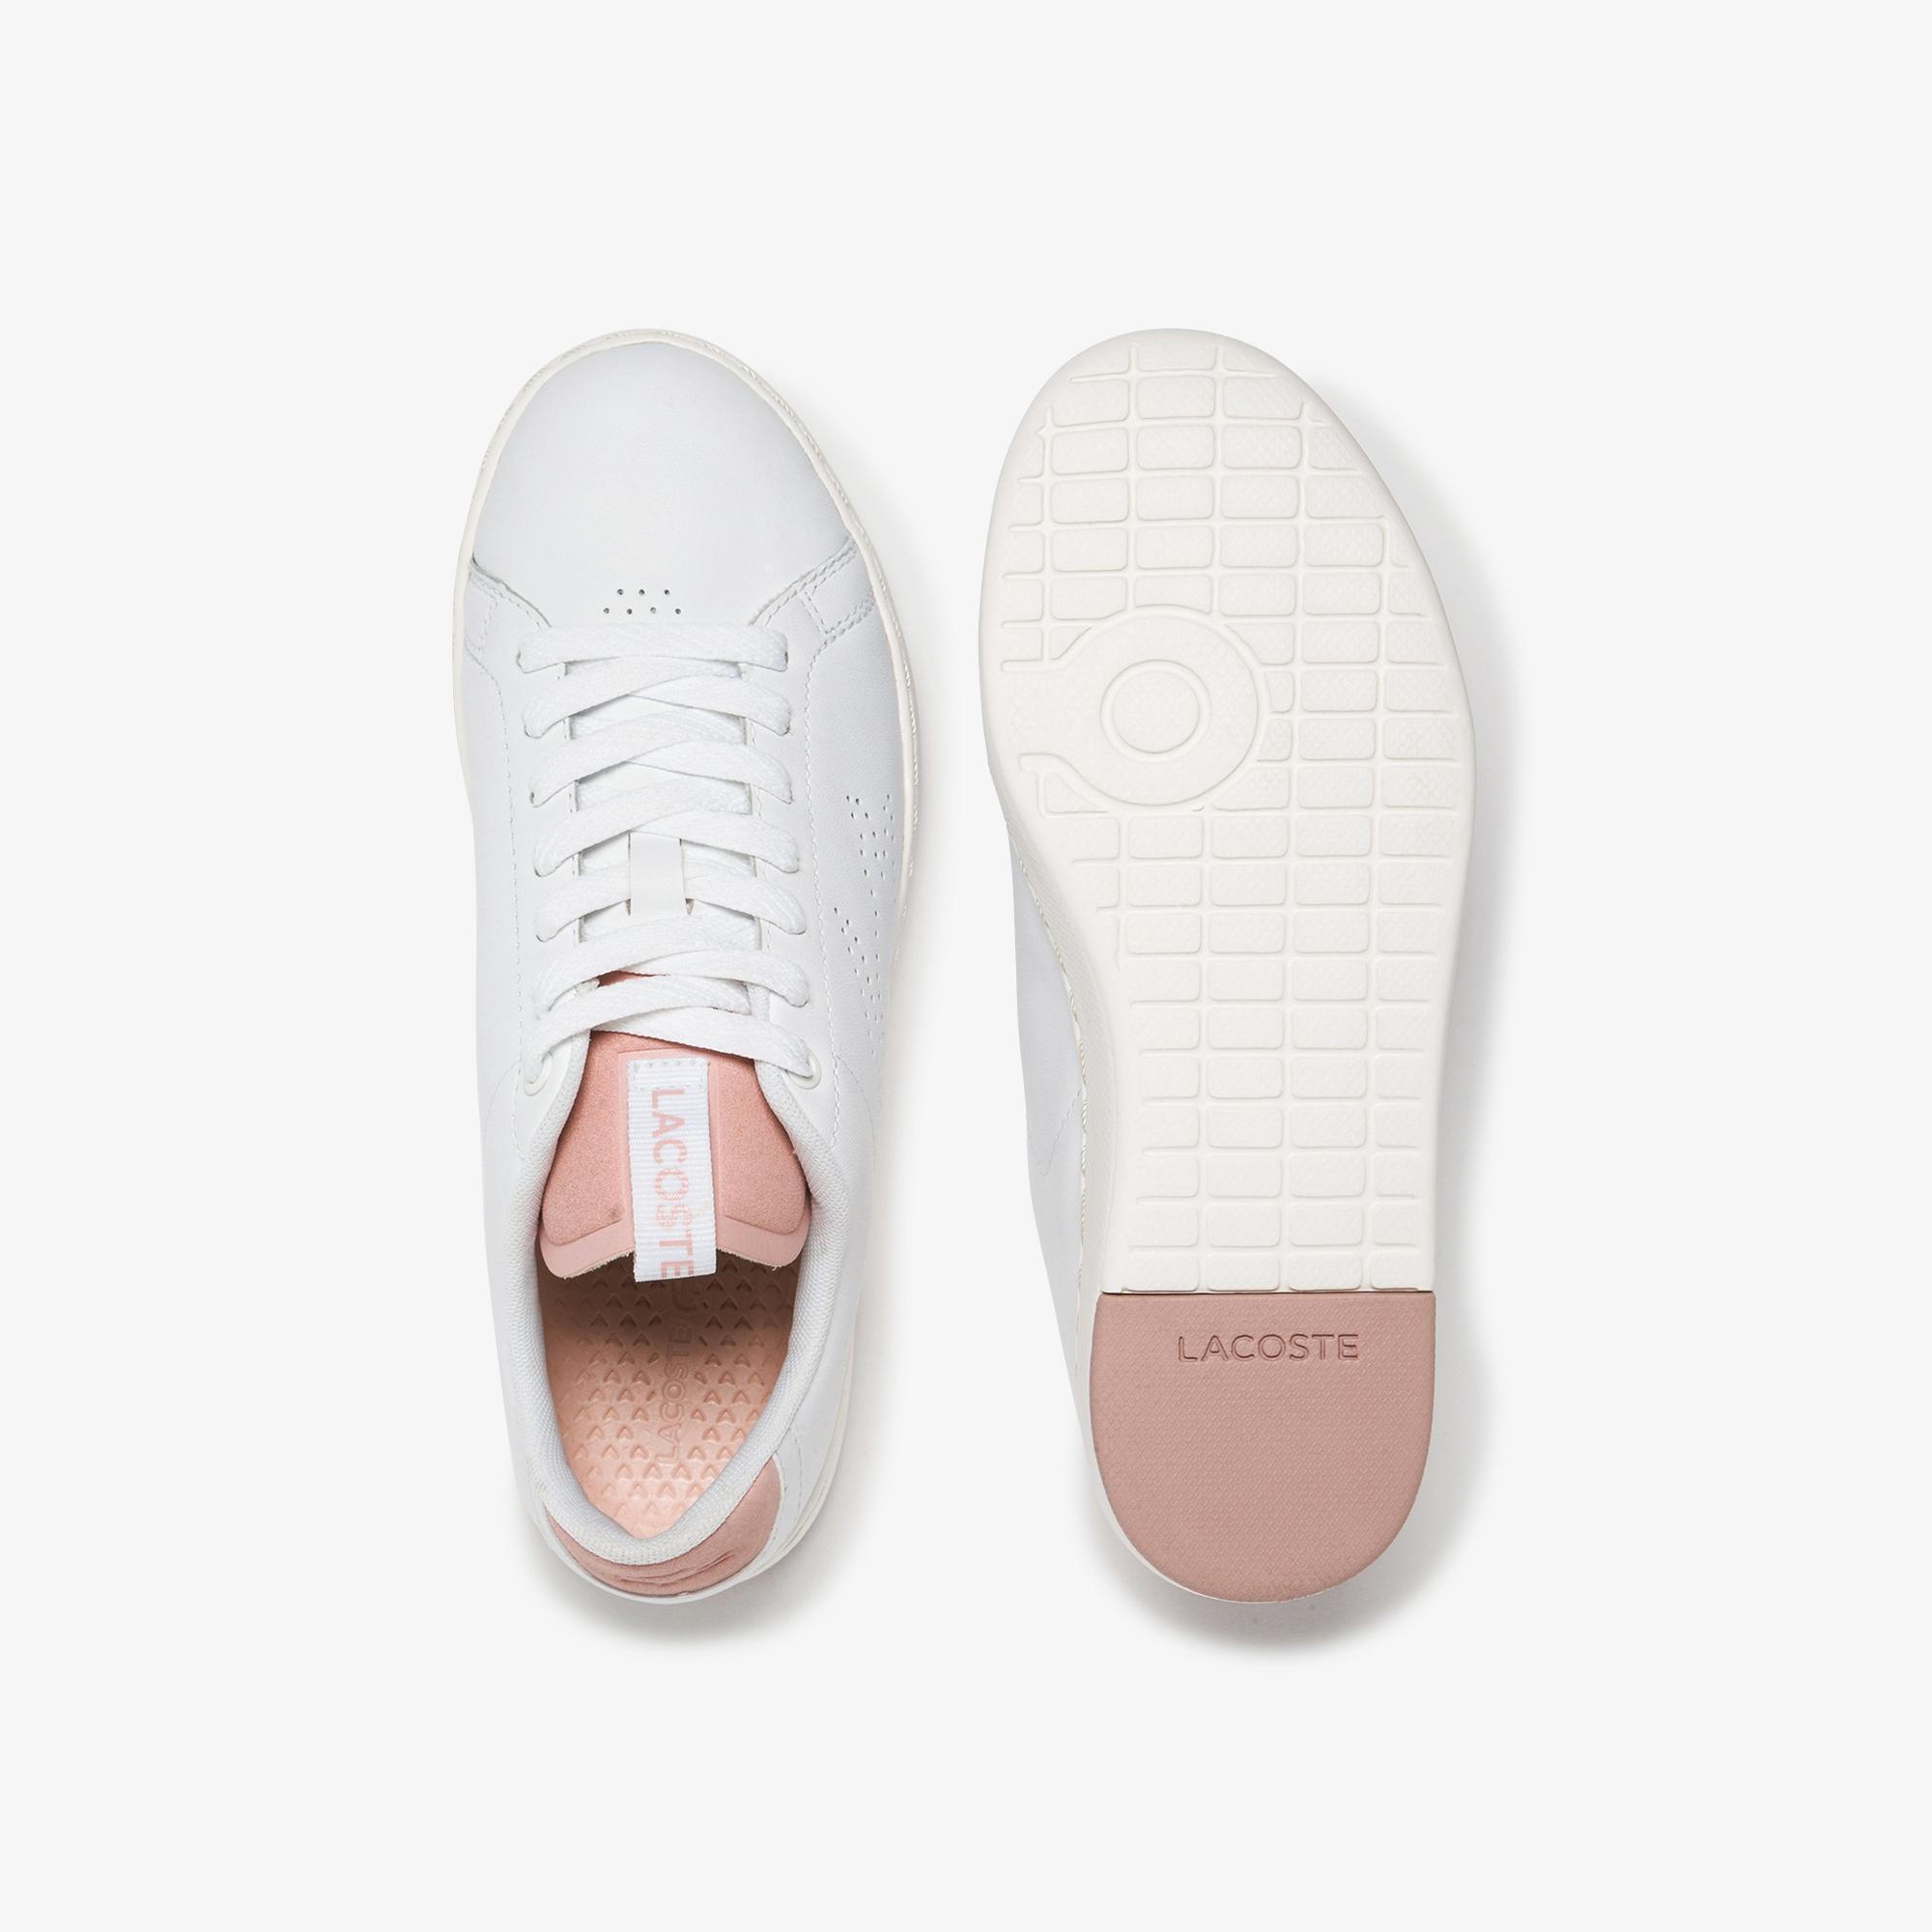 Lacoste Carnaby Evo Light-Wt 1201 Kadın Beyaz - Pudra Deri Sneaker